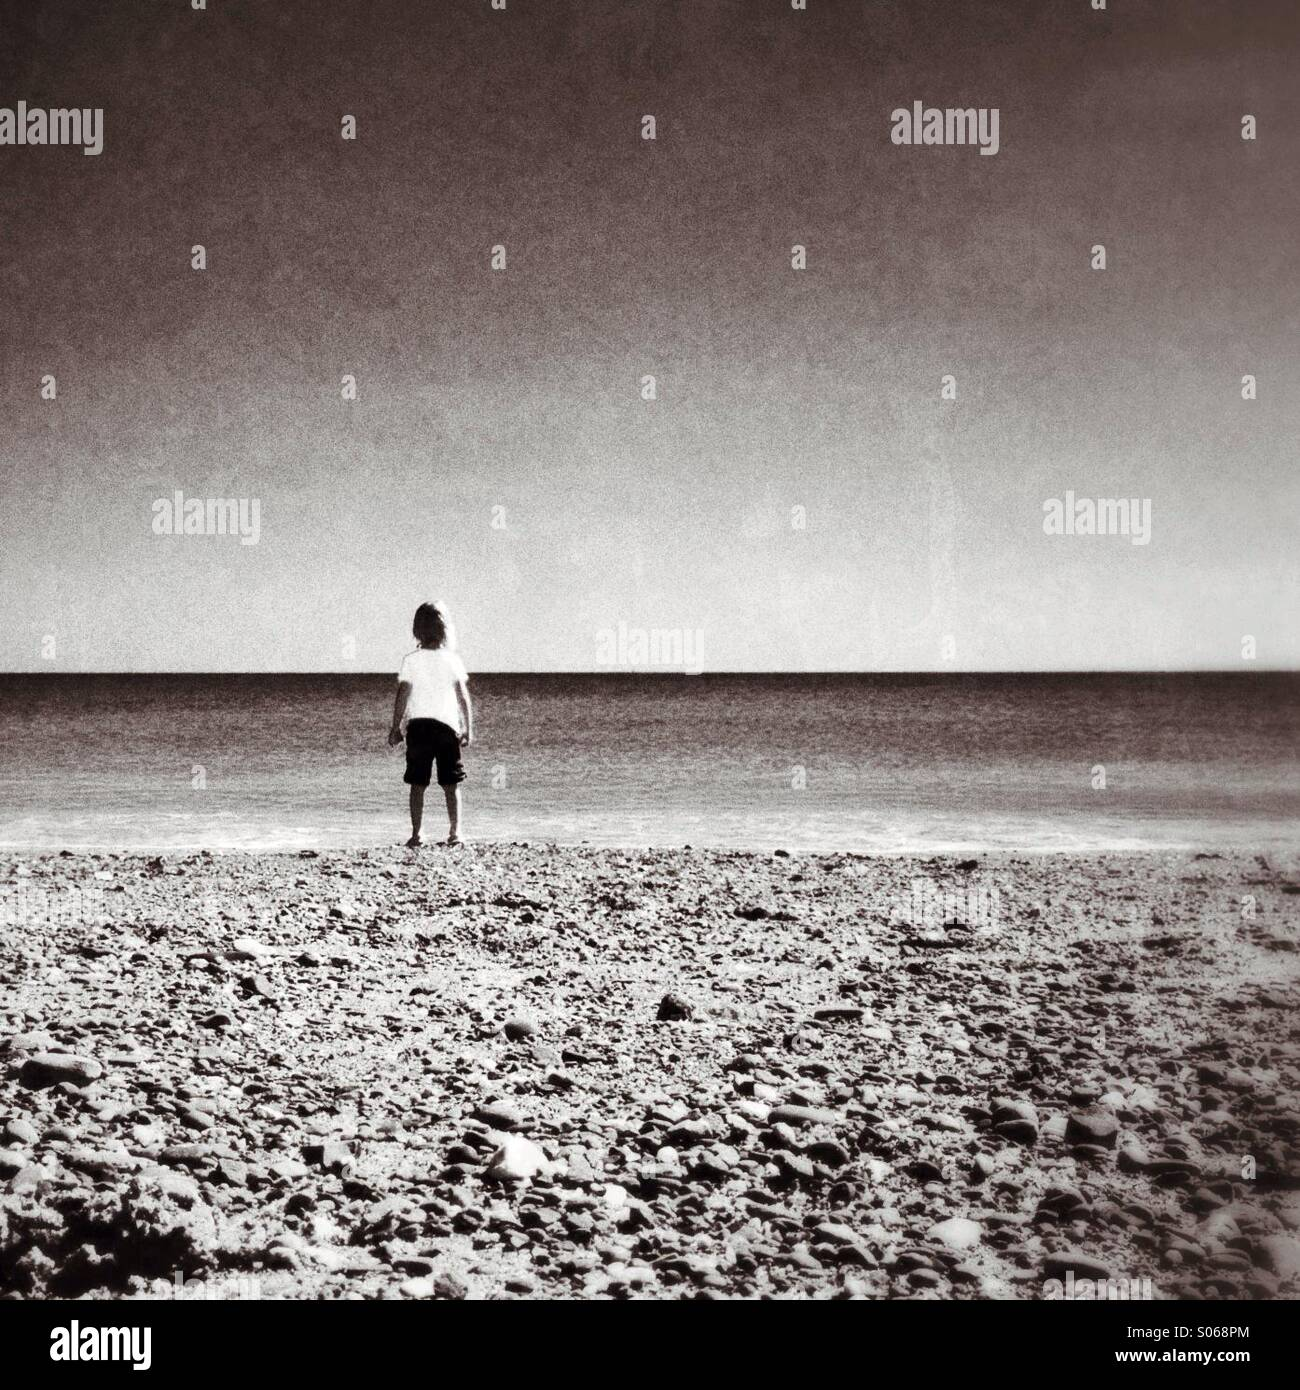 Esperando la marea para girar Imagen De Stock